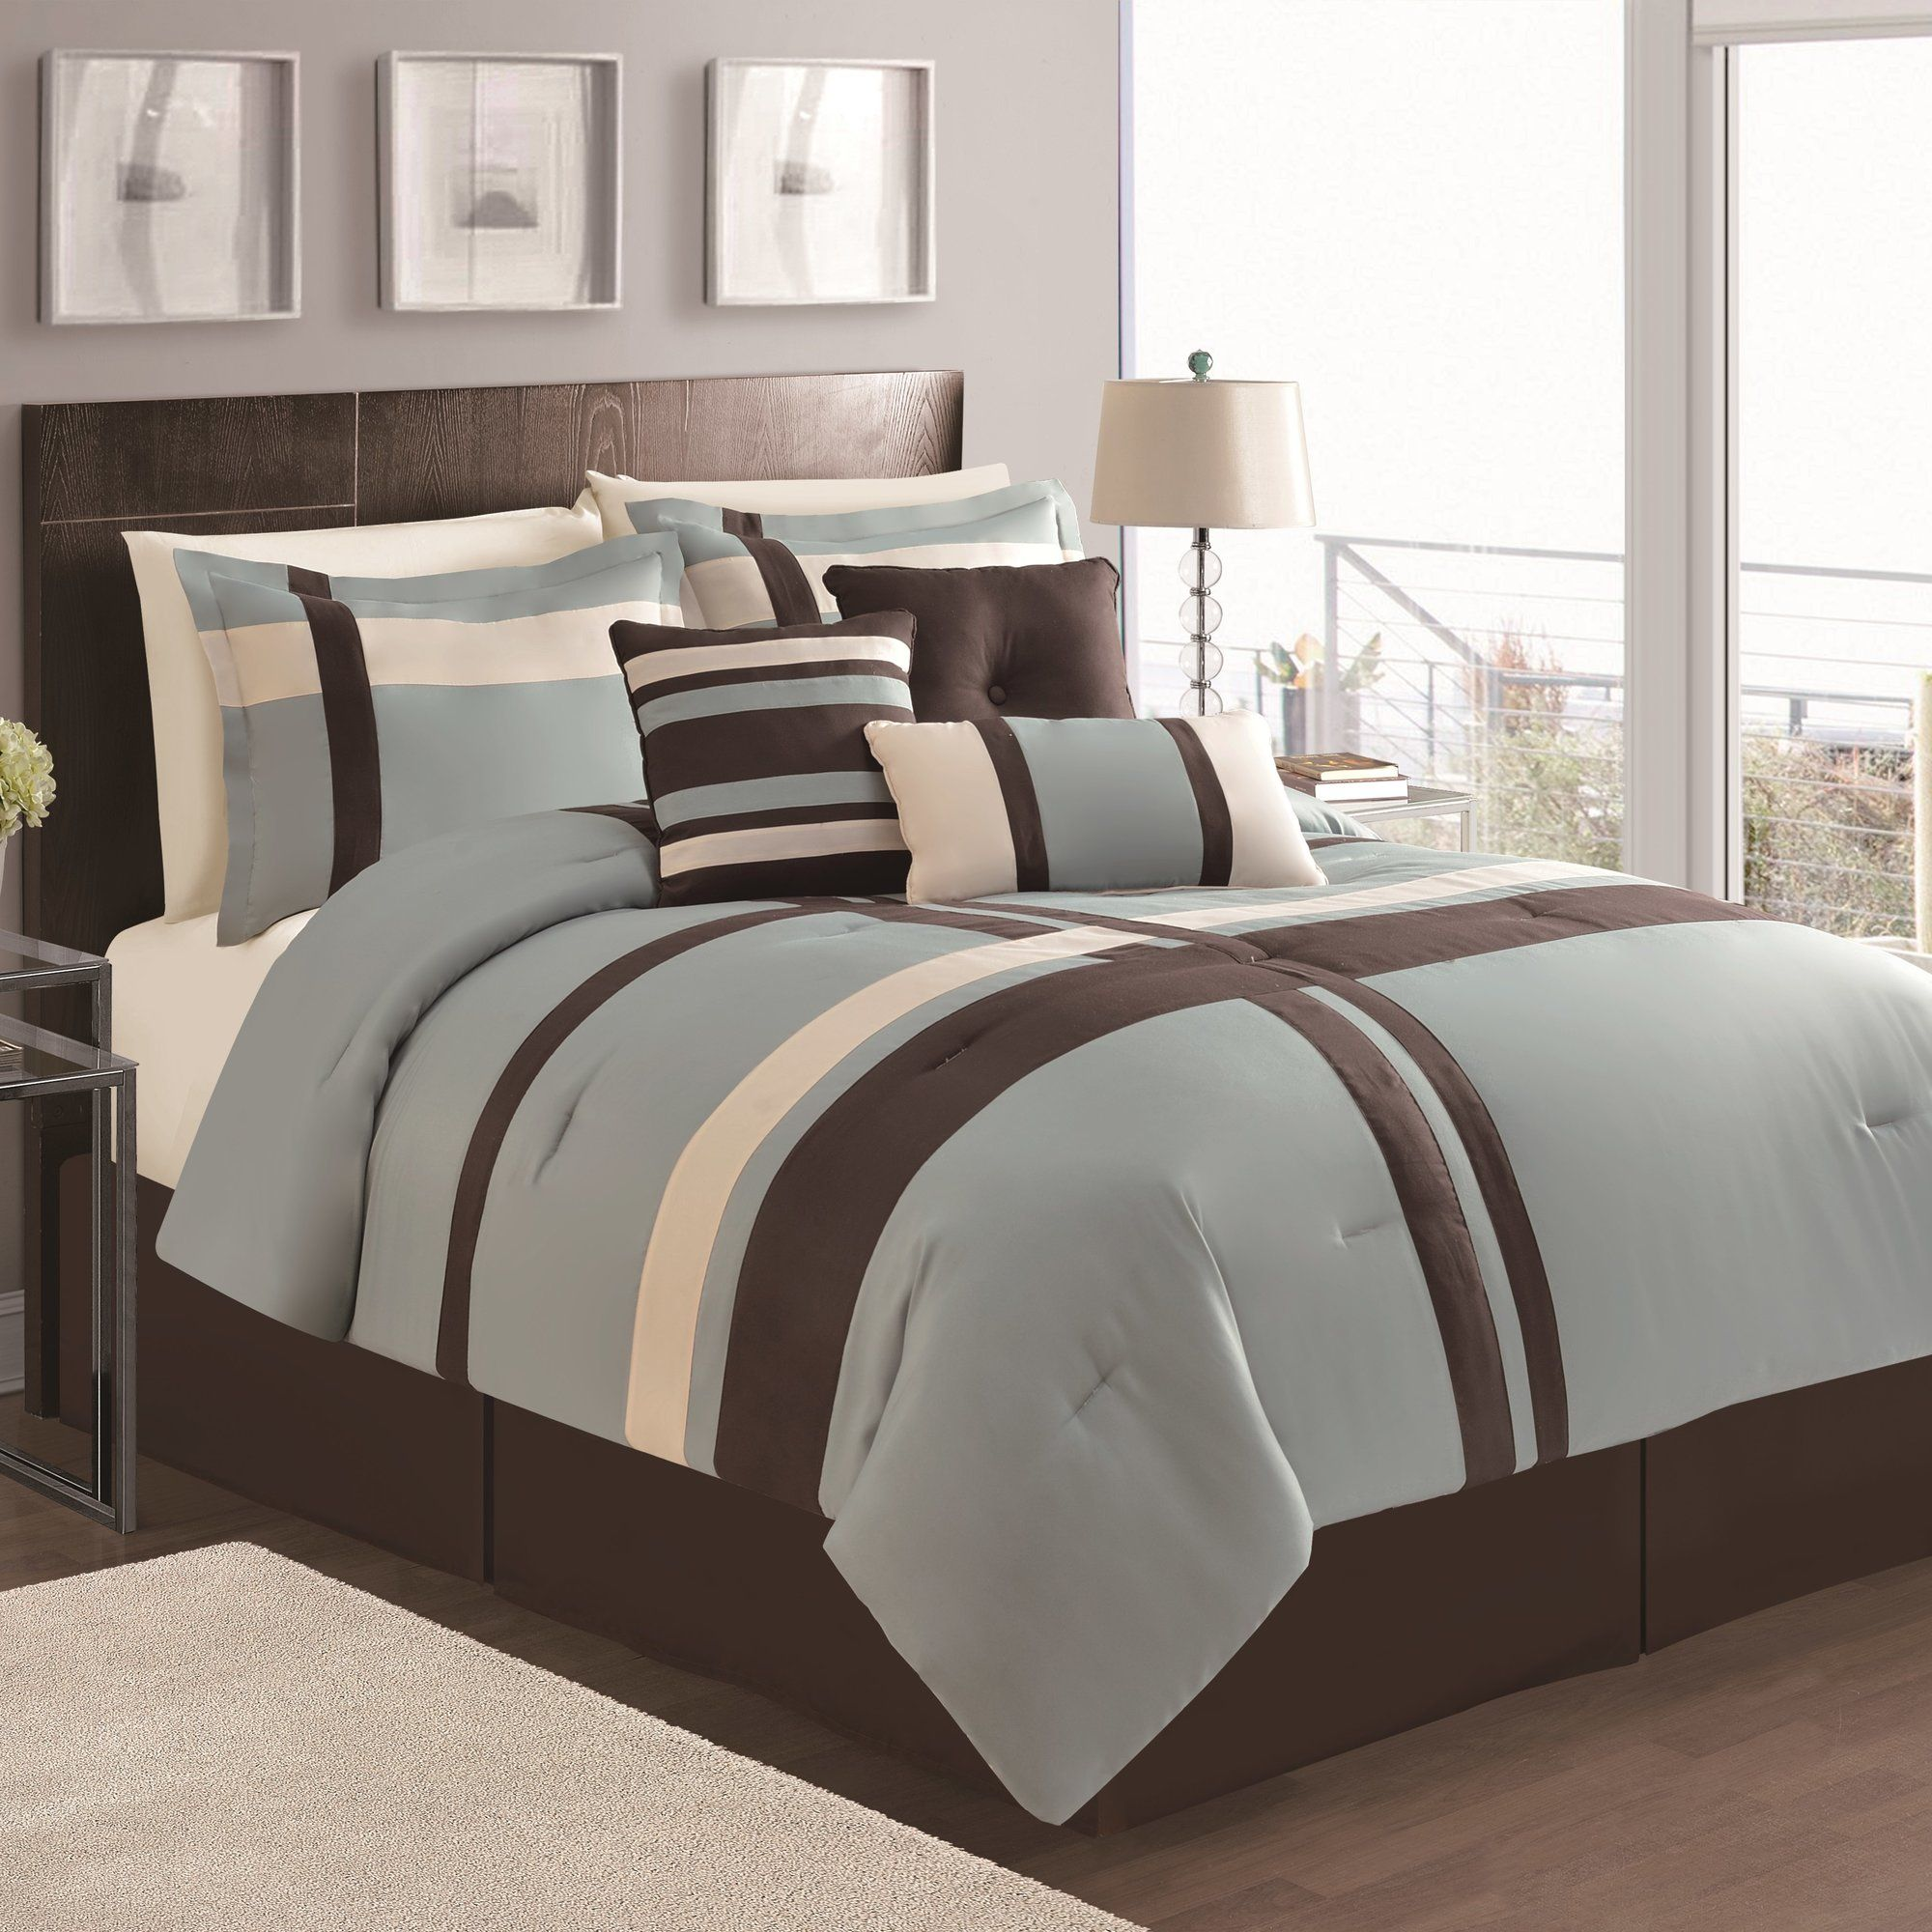 7-Piece Remy Comforter Set